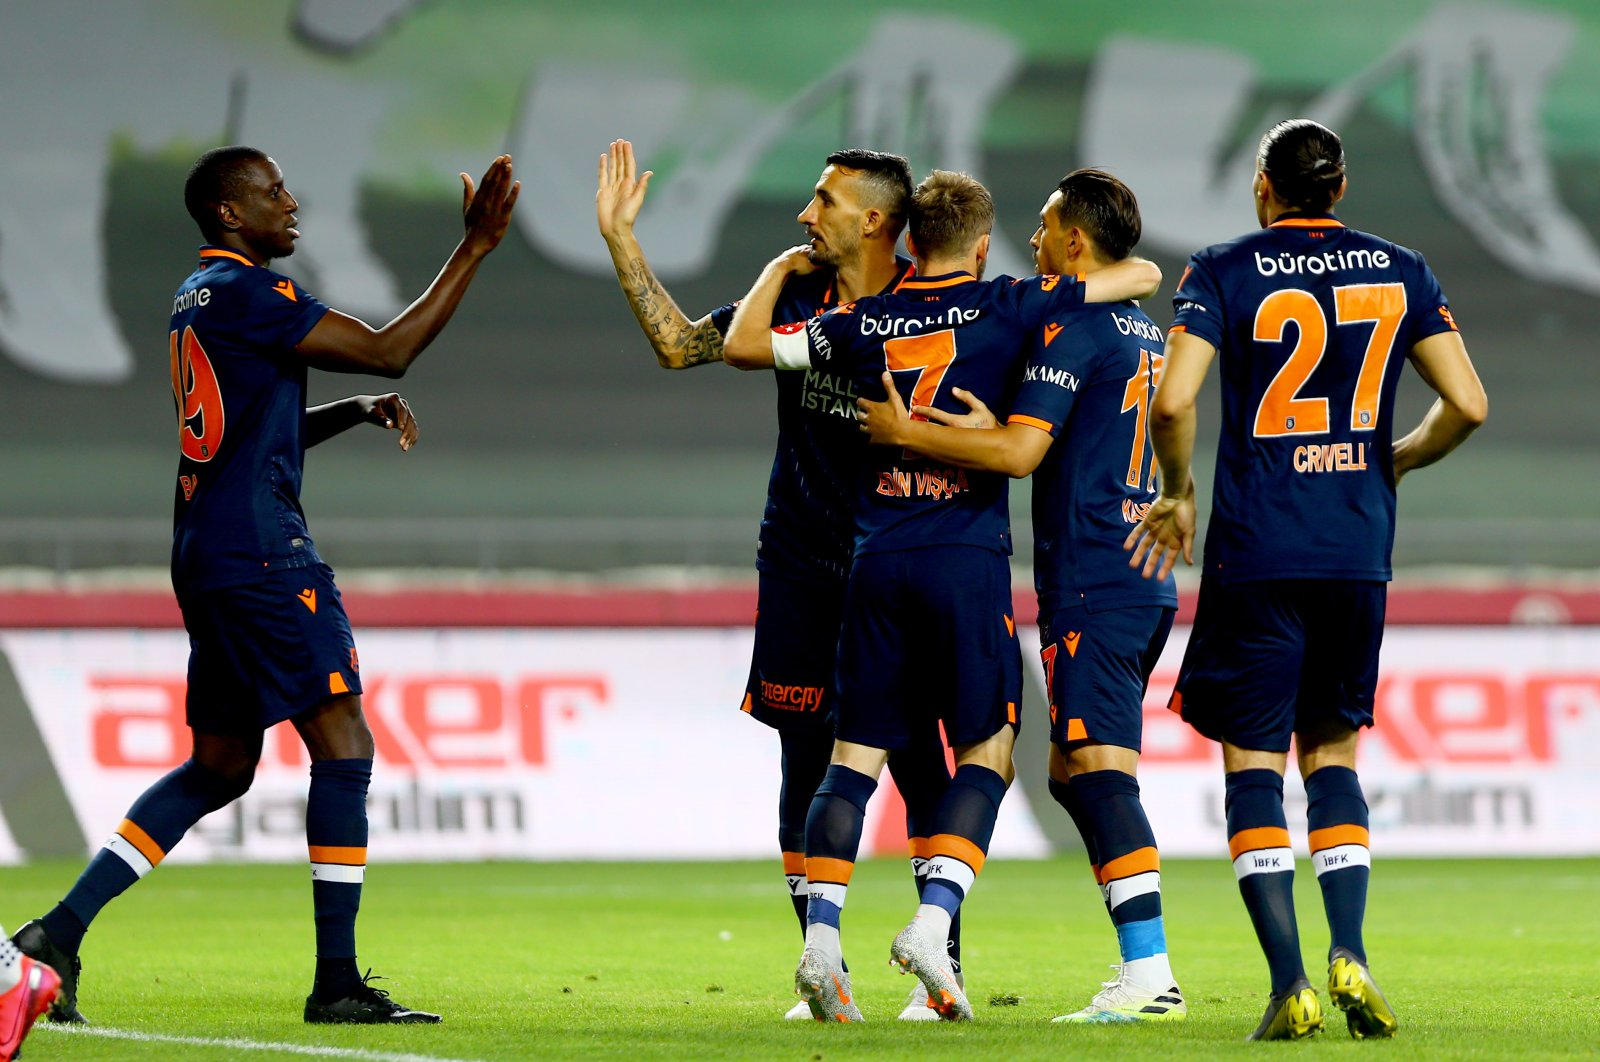 Başakşehir players celebrate a goal during a Süper Lig match against Konyaspor in Konya, Turkey, July 13, 2020. (AA Photo)